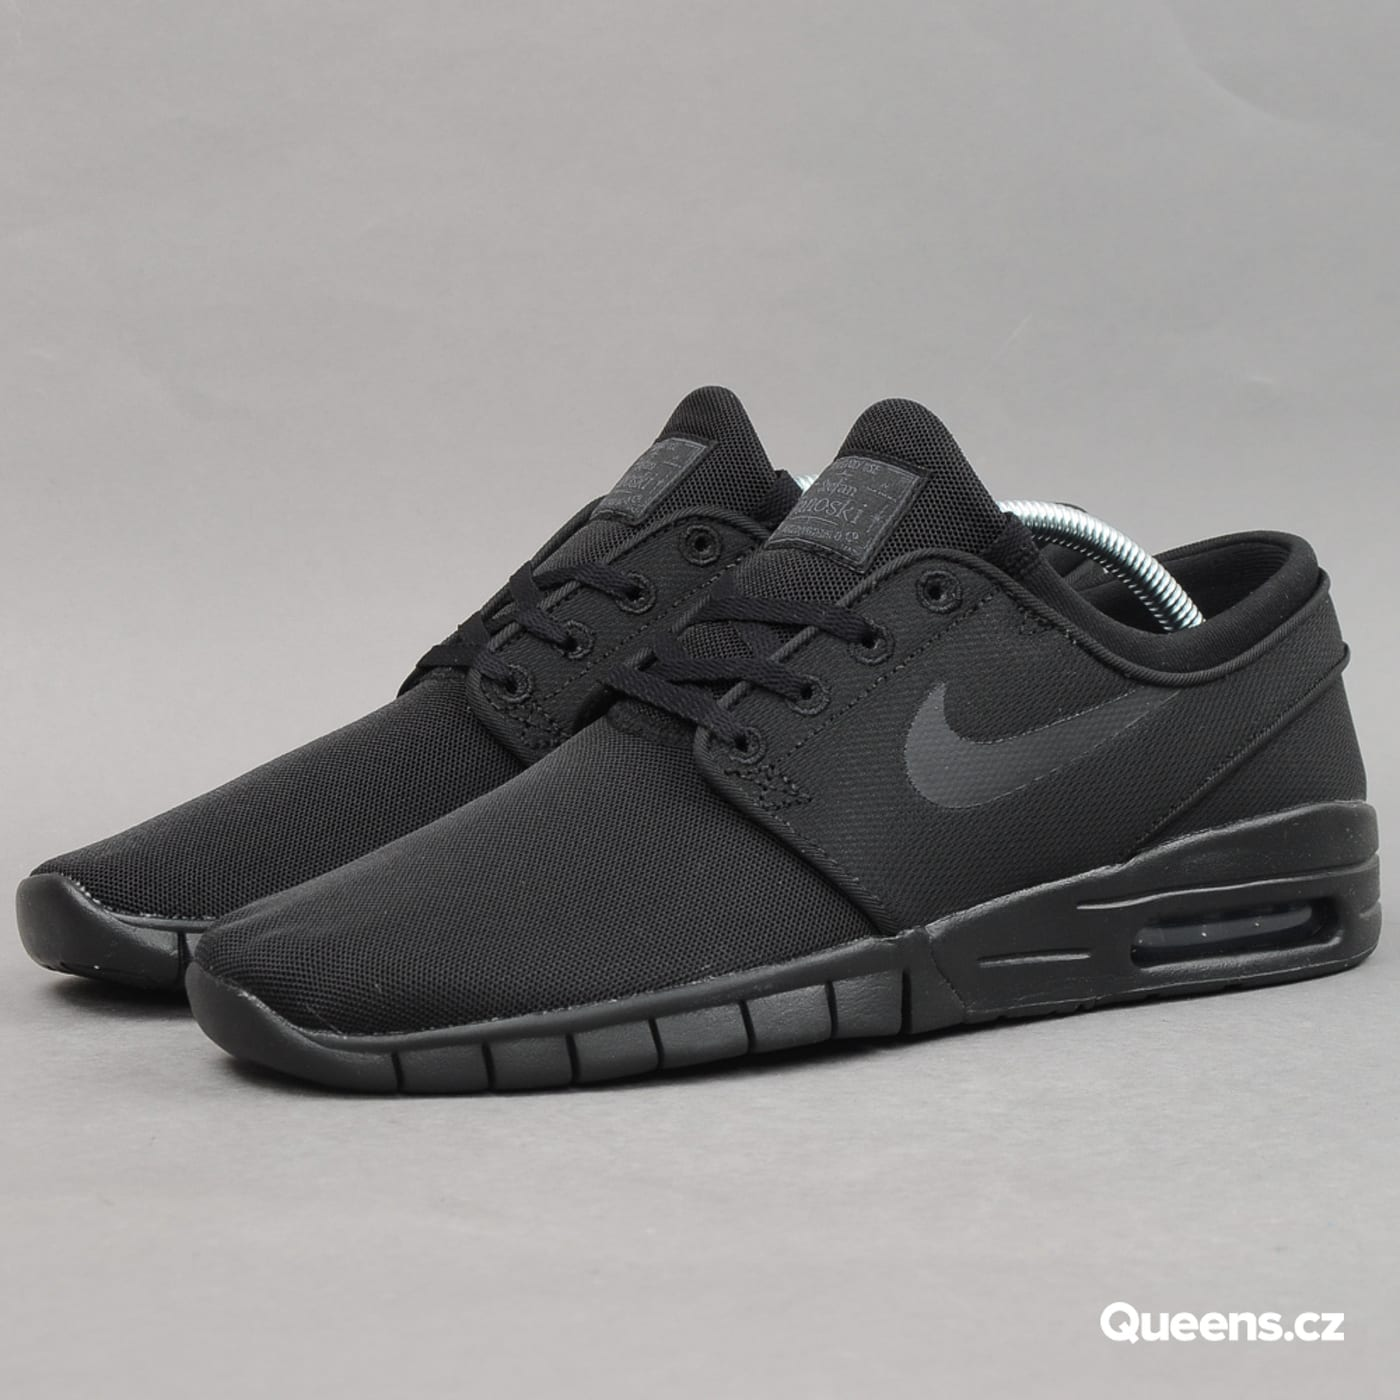 Boty Nike Stefan Janoski Max (631303-007) – Queens 💚 64e7b6947ba